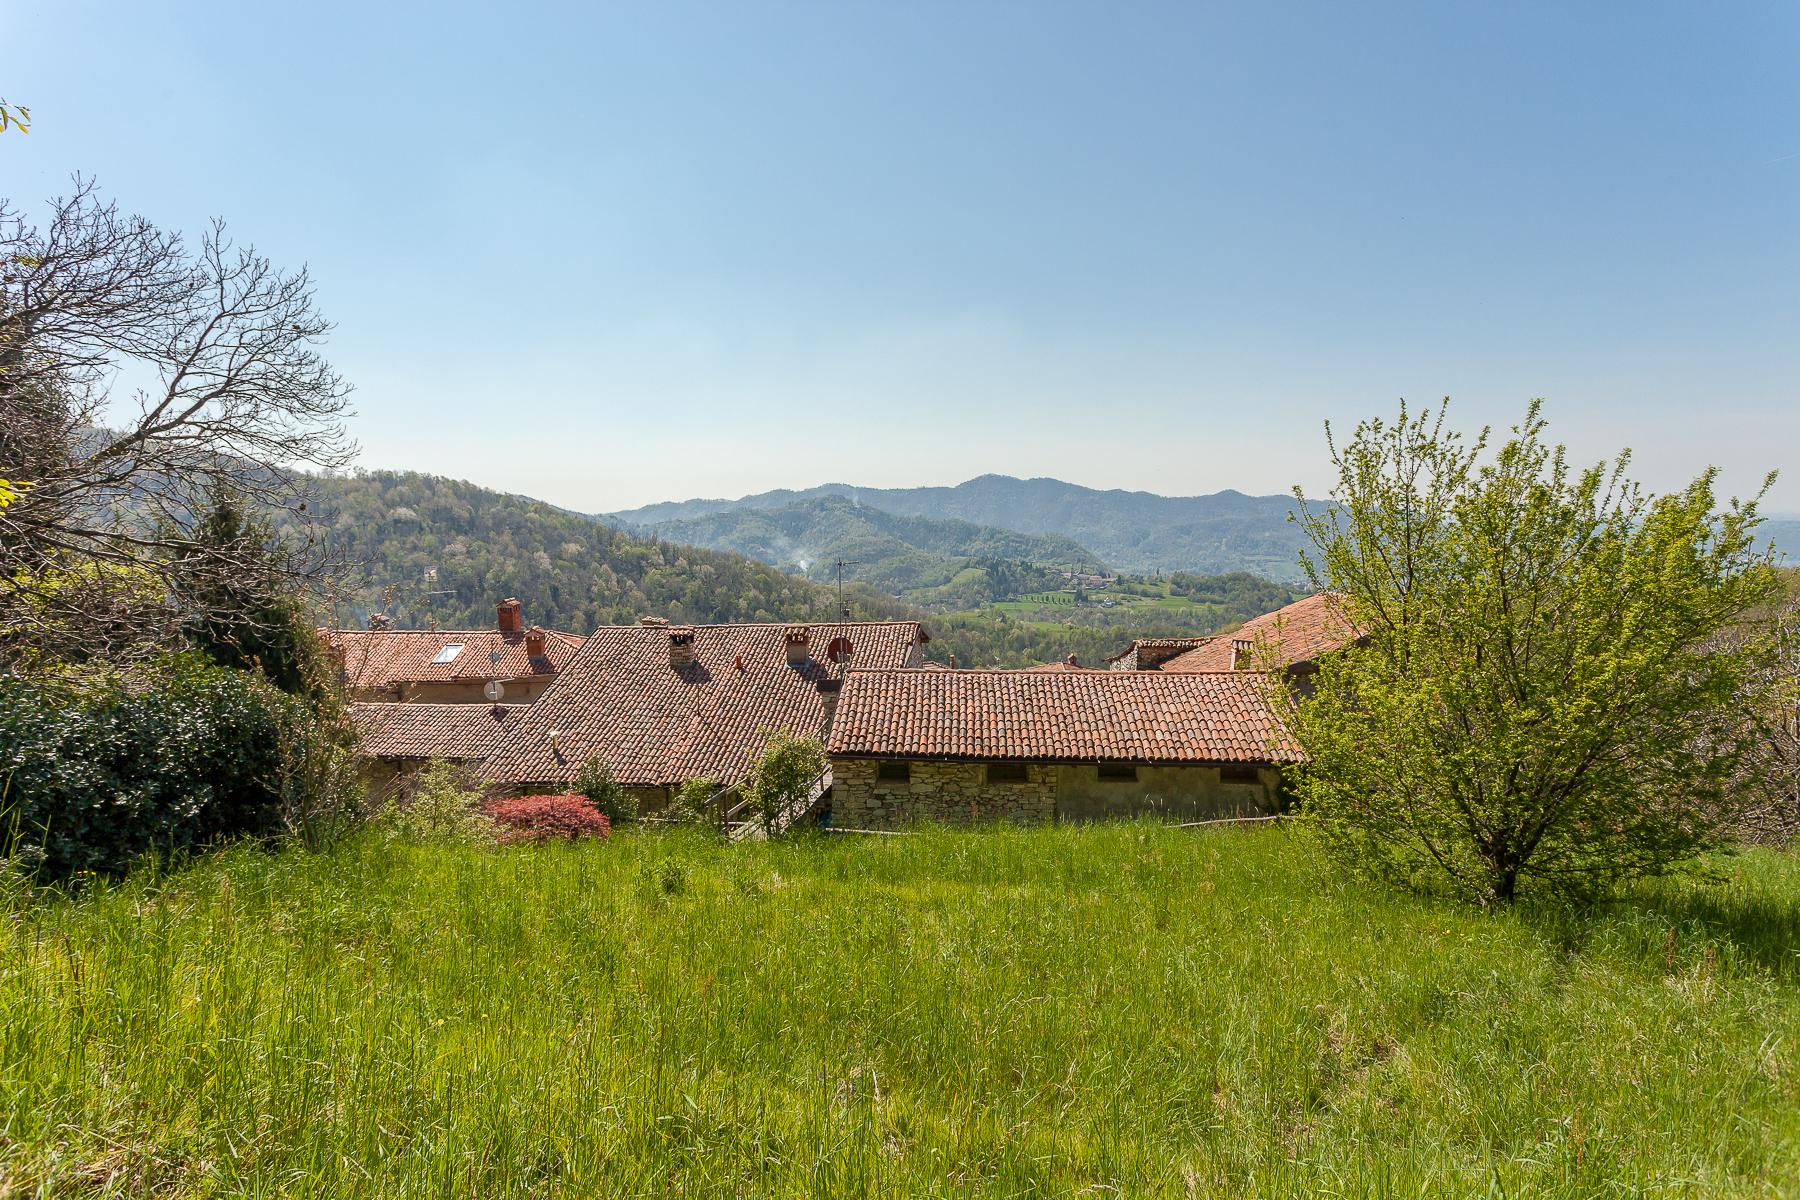 Casa indipendente in Vendita a Caprino Bergamasco: 5 locali, 500 mq - Foto 15